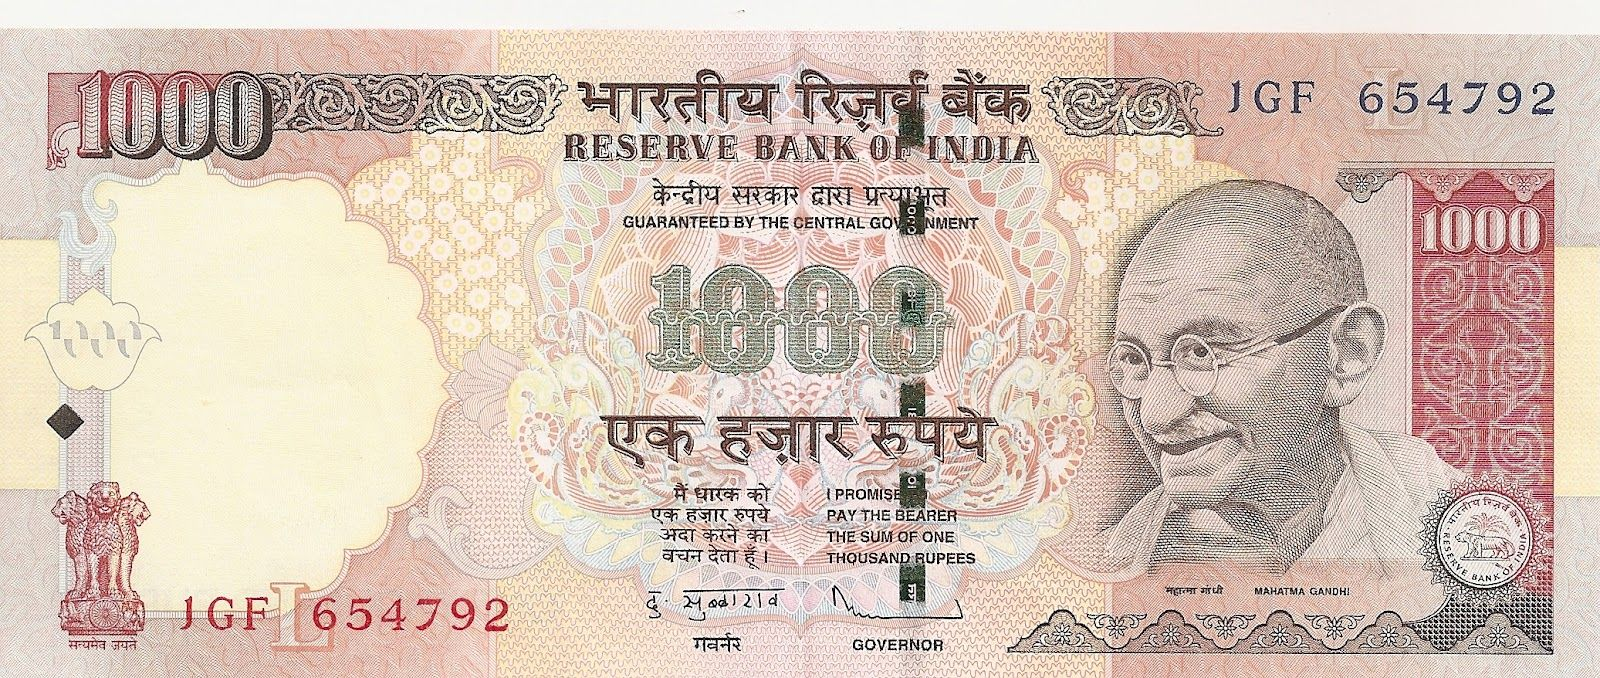 1000 Rupee Note - Front Image   Money notes, Money, Forex trading basics